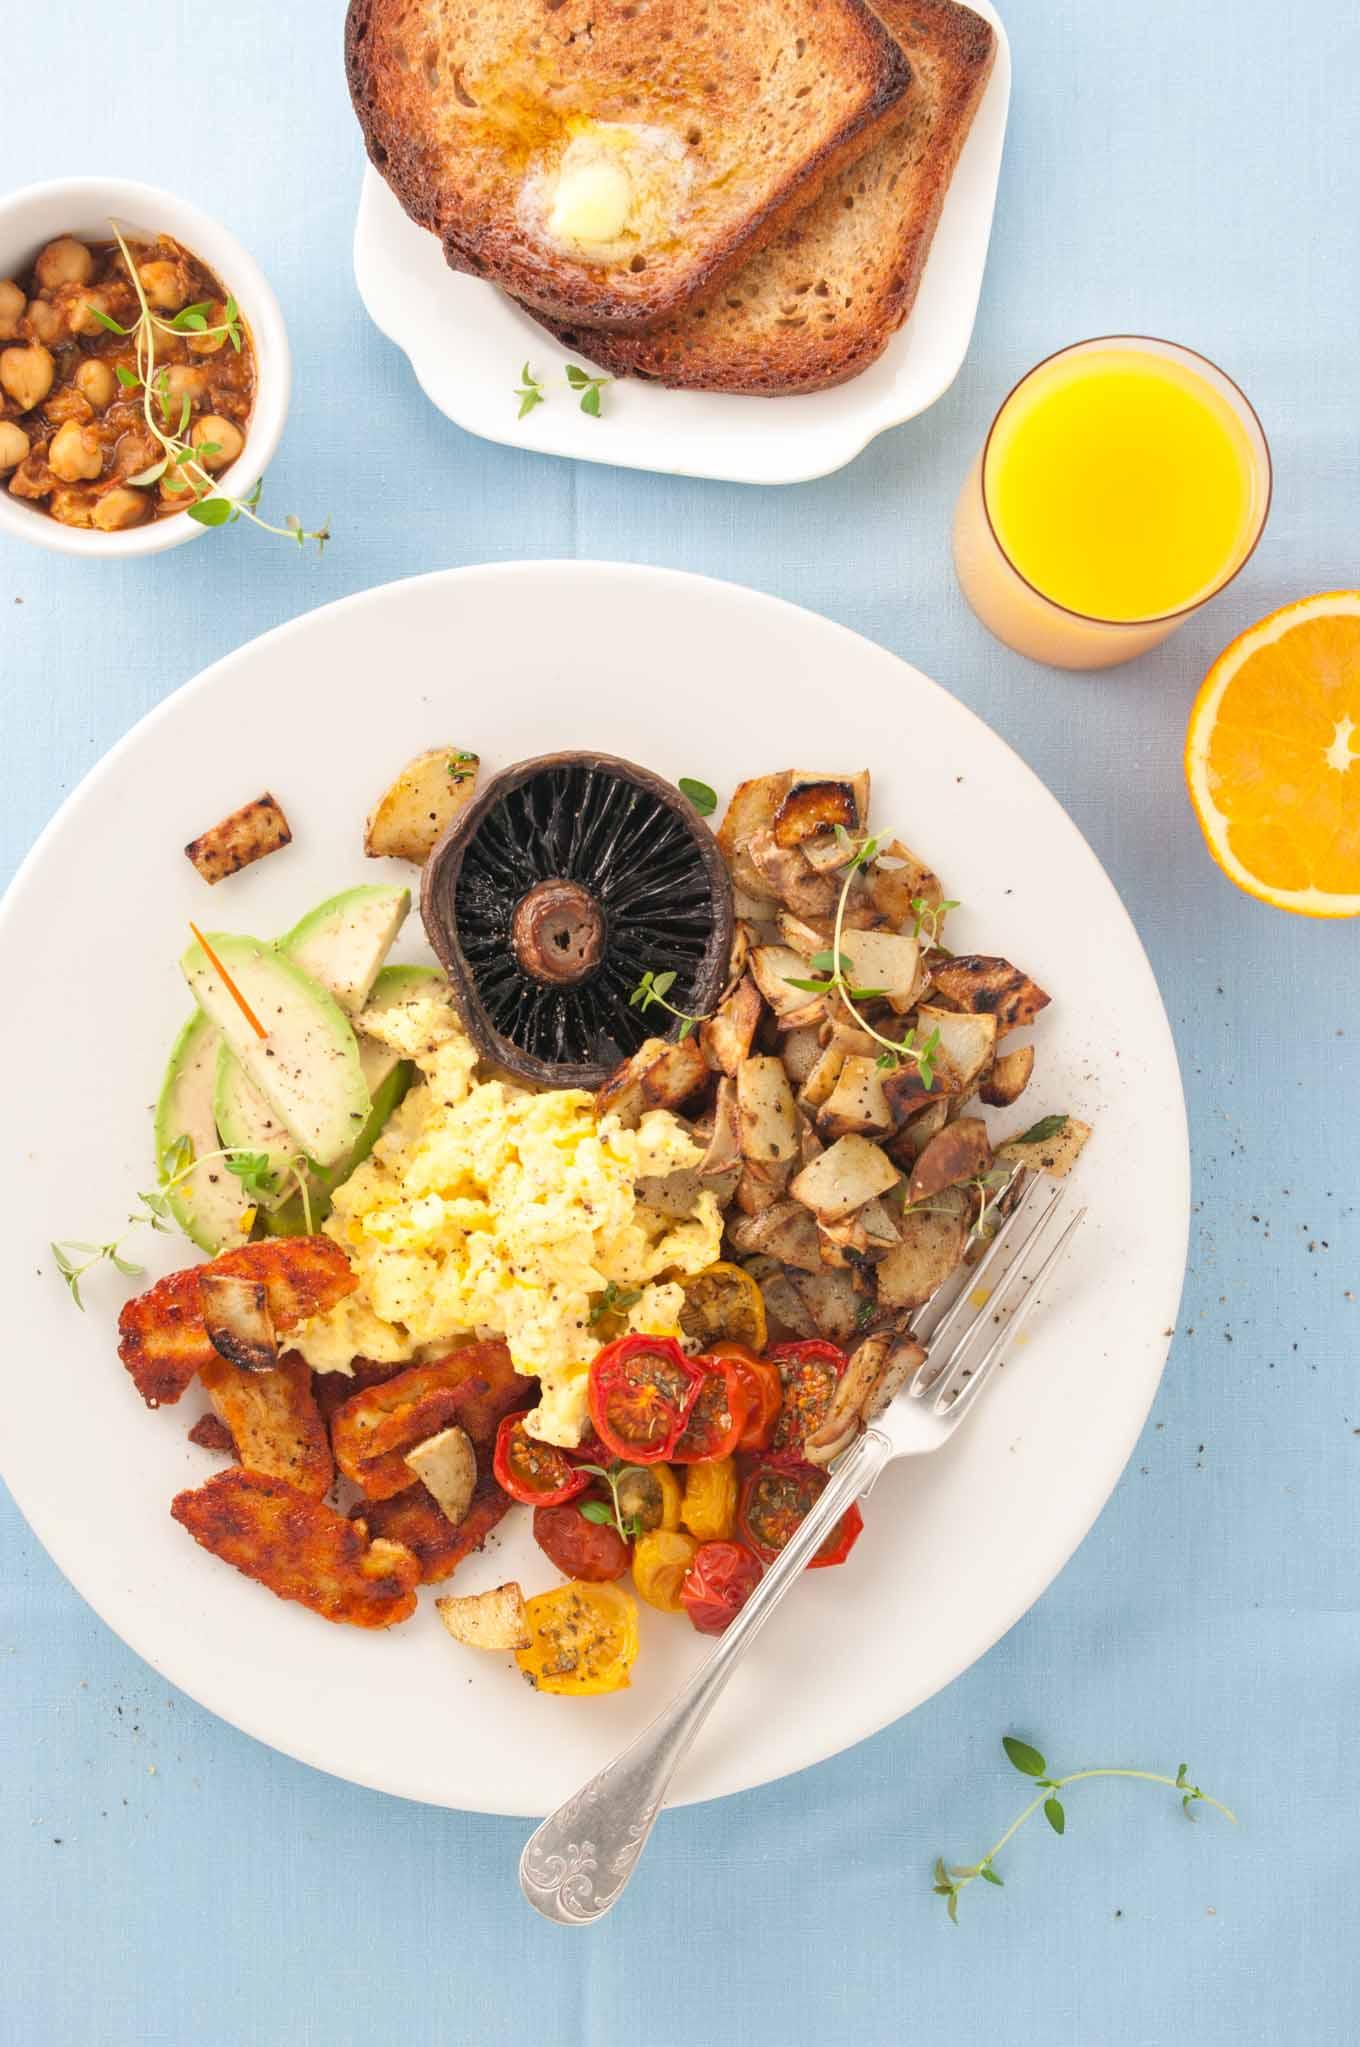 Vegetarian full english breakfast delicious from scratch vegetarian full english breakfast forumfinder Choice Image